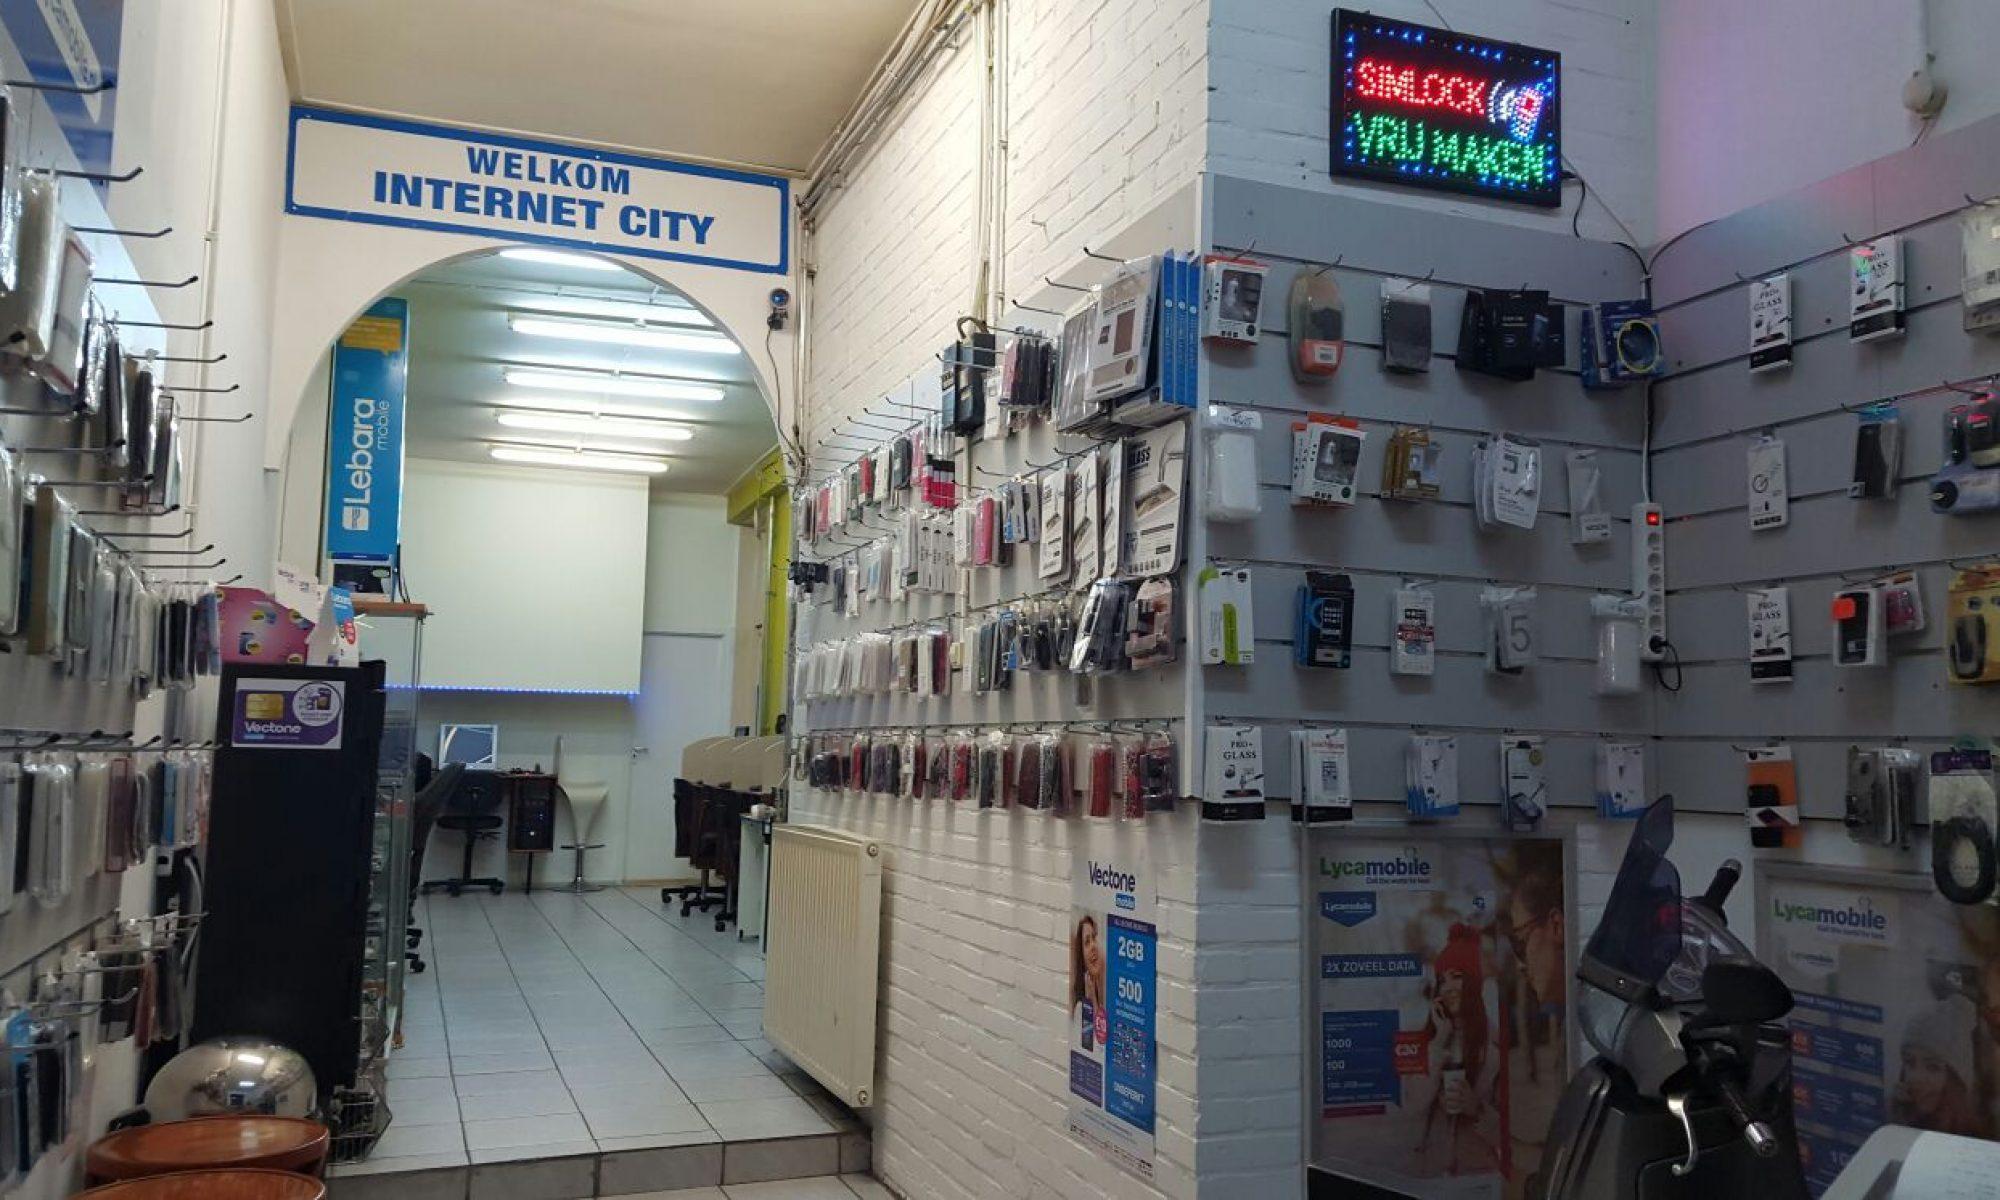 Call Internetcity